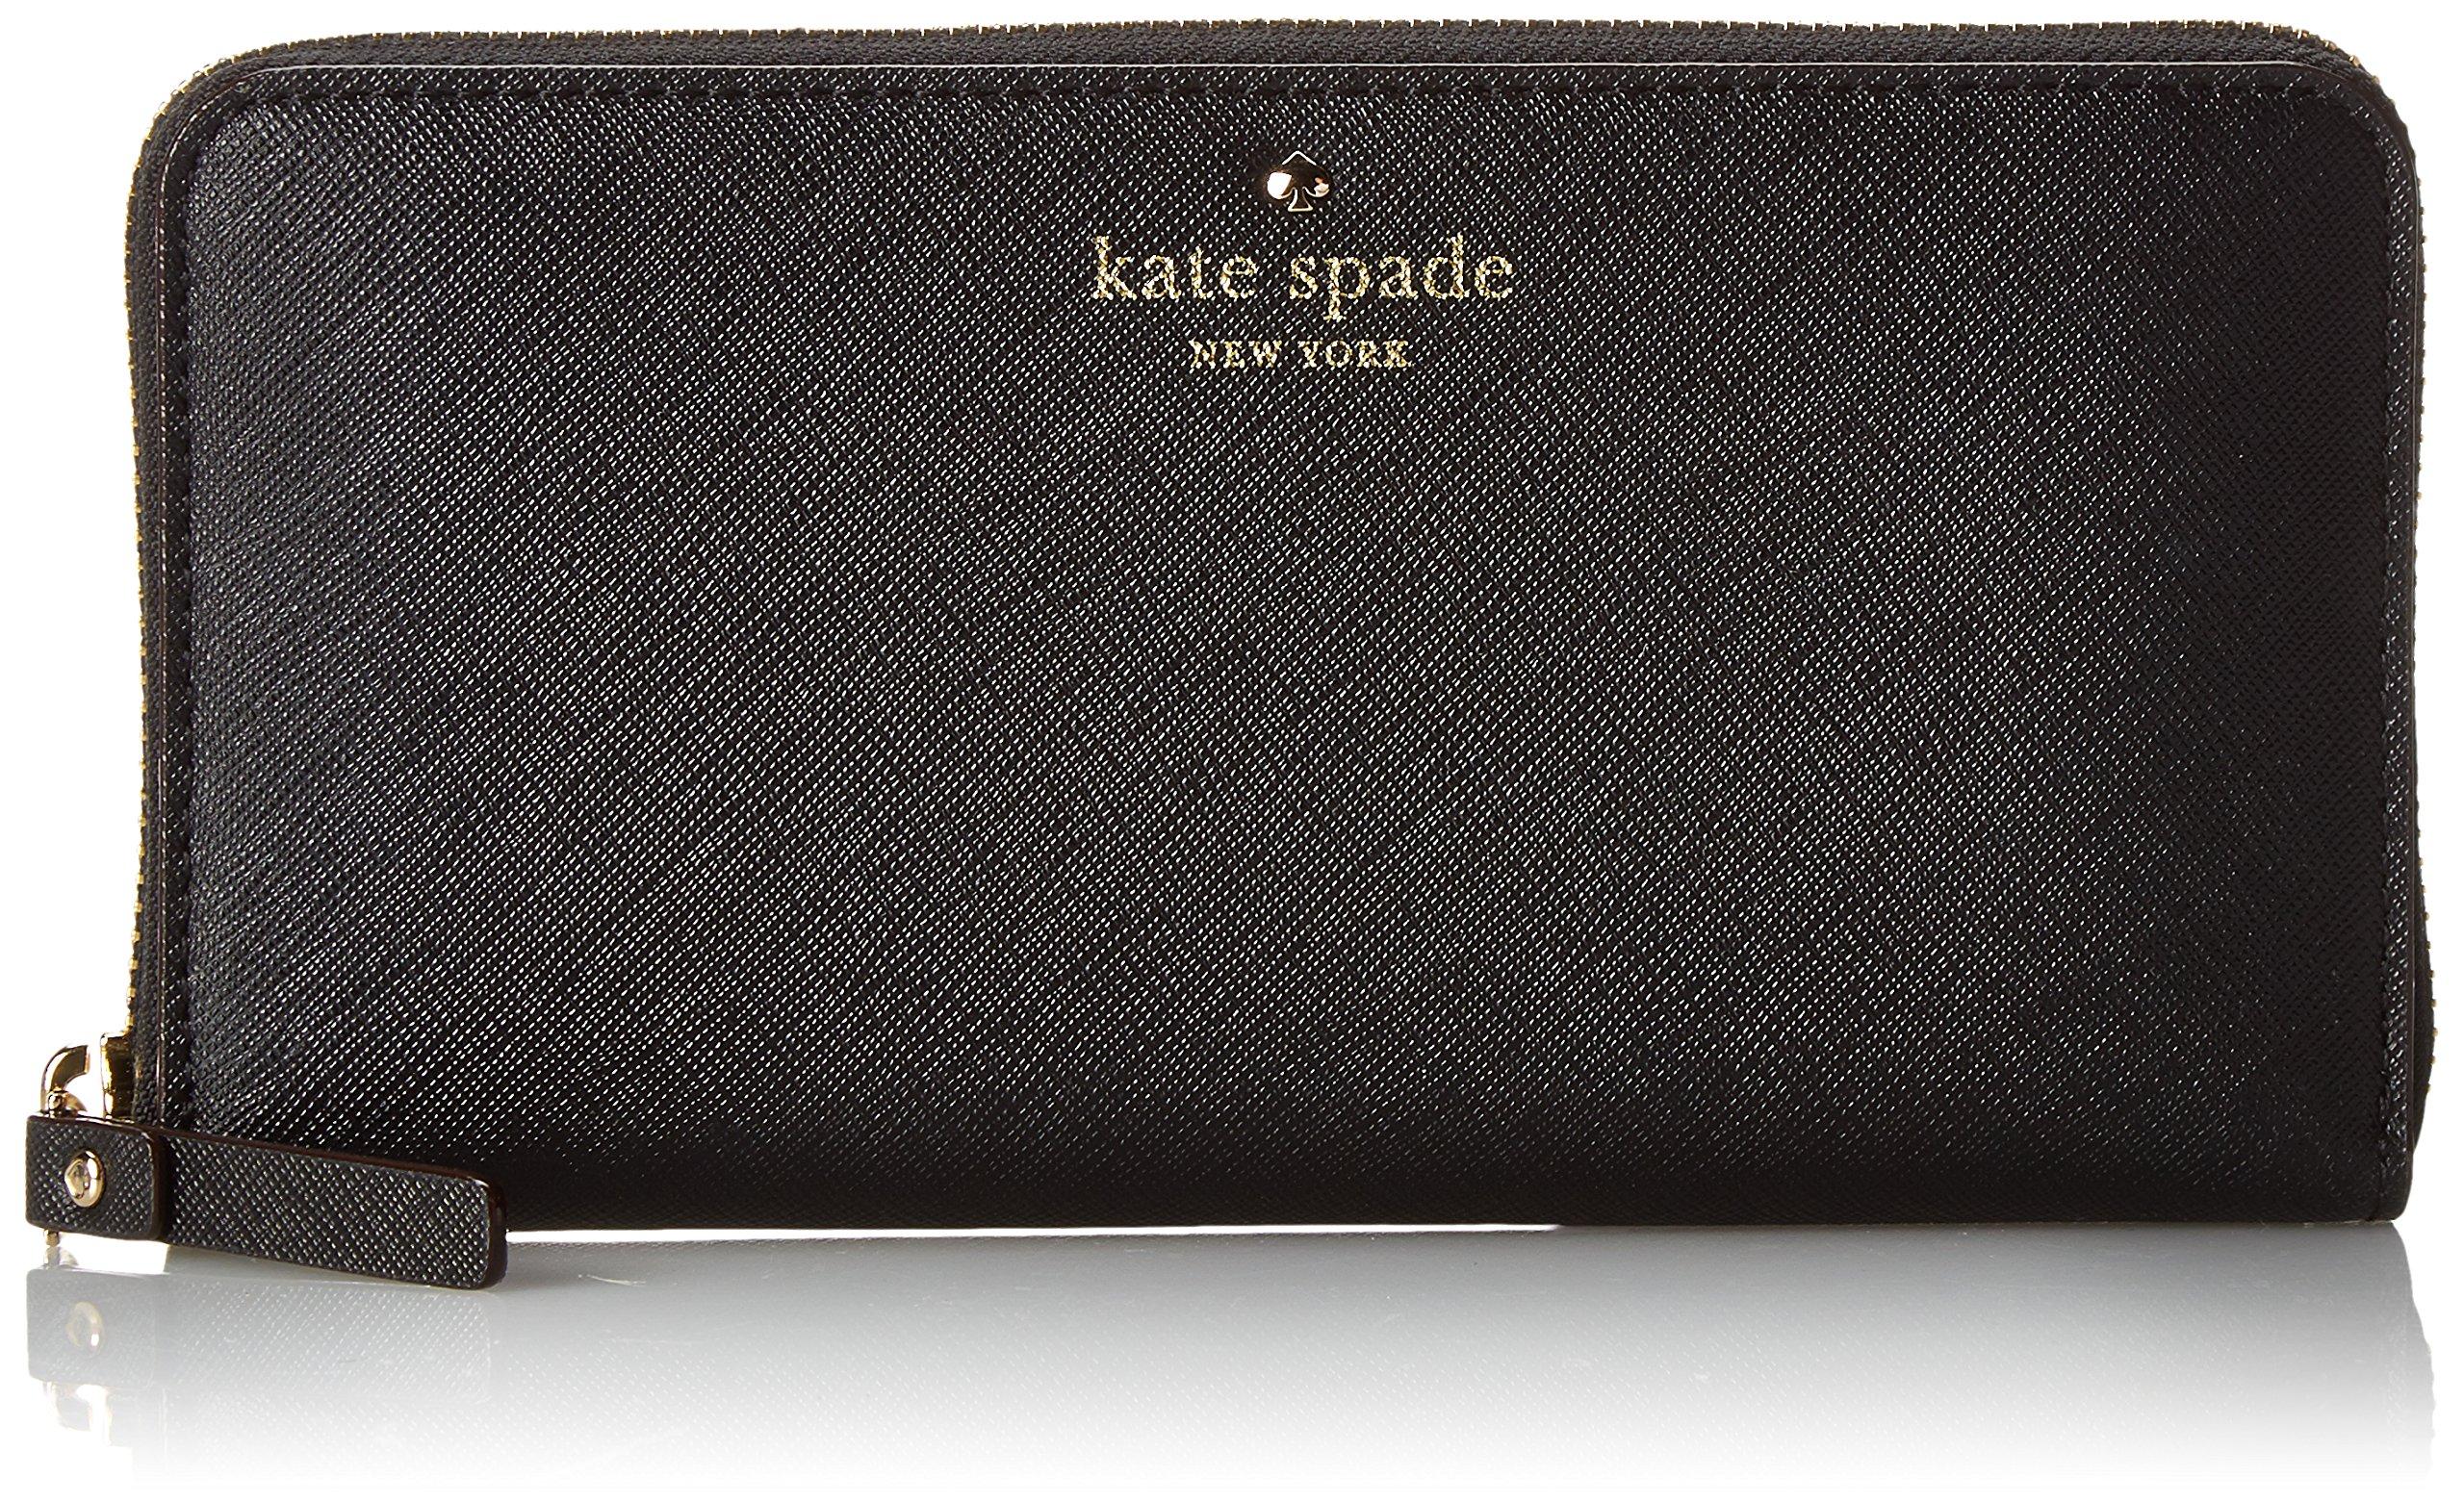 kate spade new york Cedar Street Lacey Wallet,Black,One Size